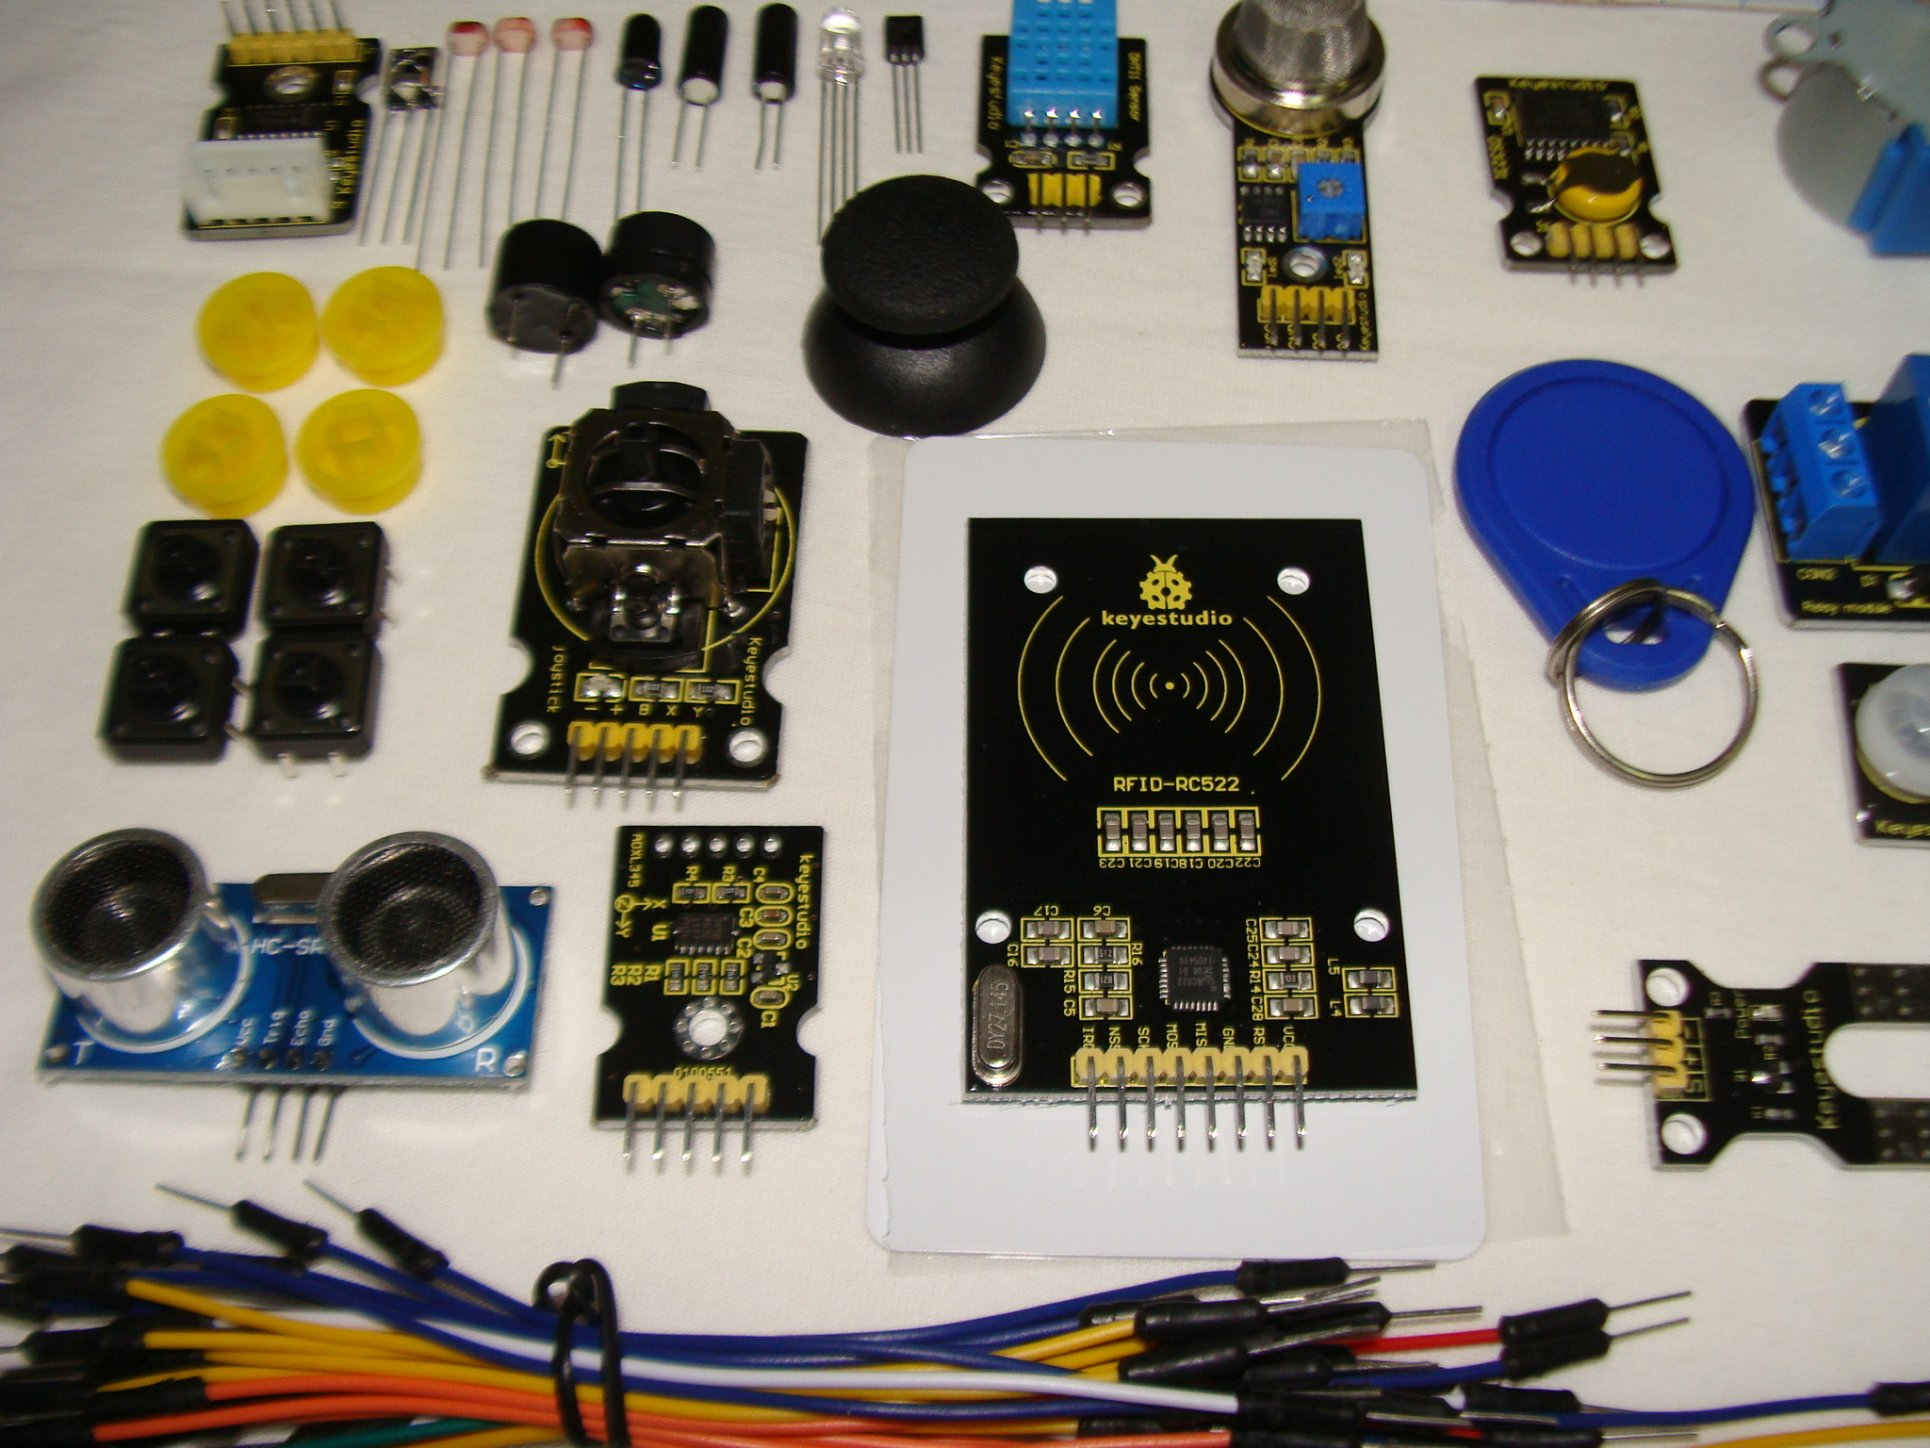 Kit arduino completo nível básico intermediário edição